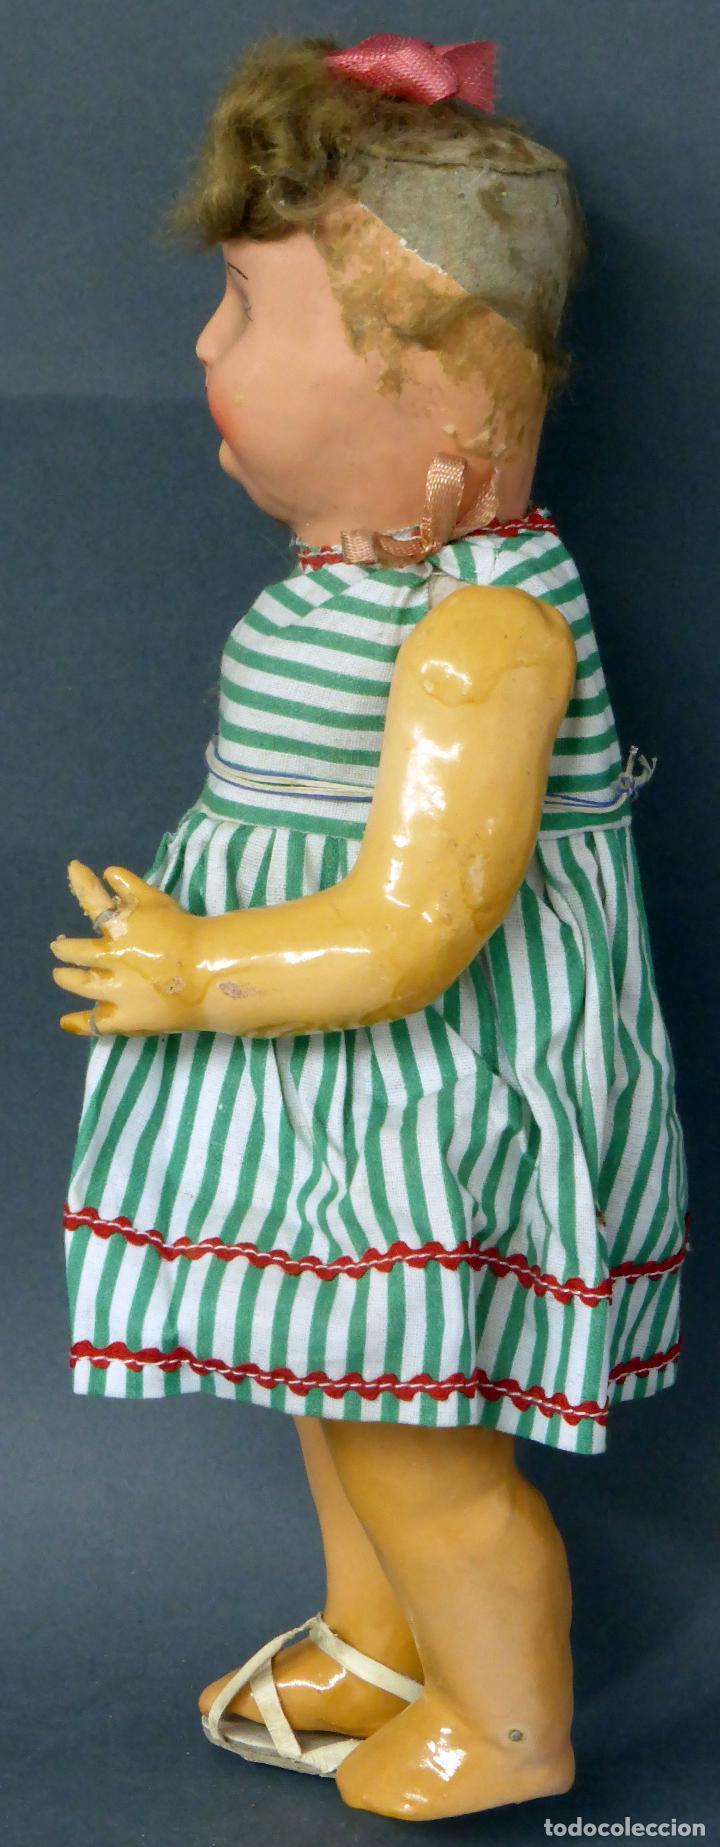 Muñeca española clasica: Muñeca popular cartón piedra articulada ropa original peluca sandalias años 40 33 cm época Mariquita - Foto 3 - 88976784